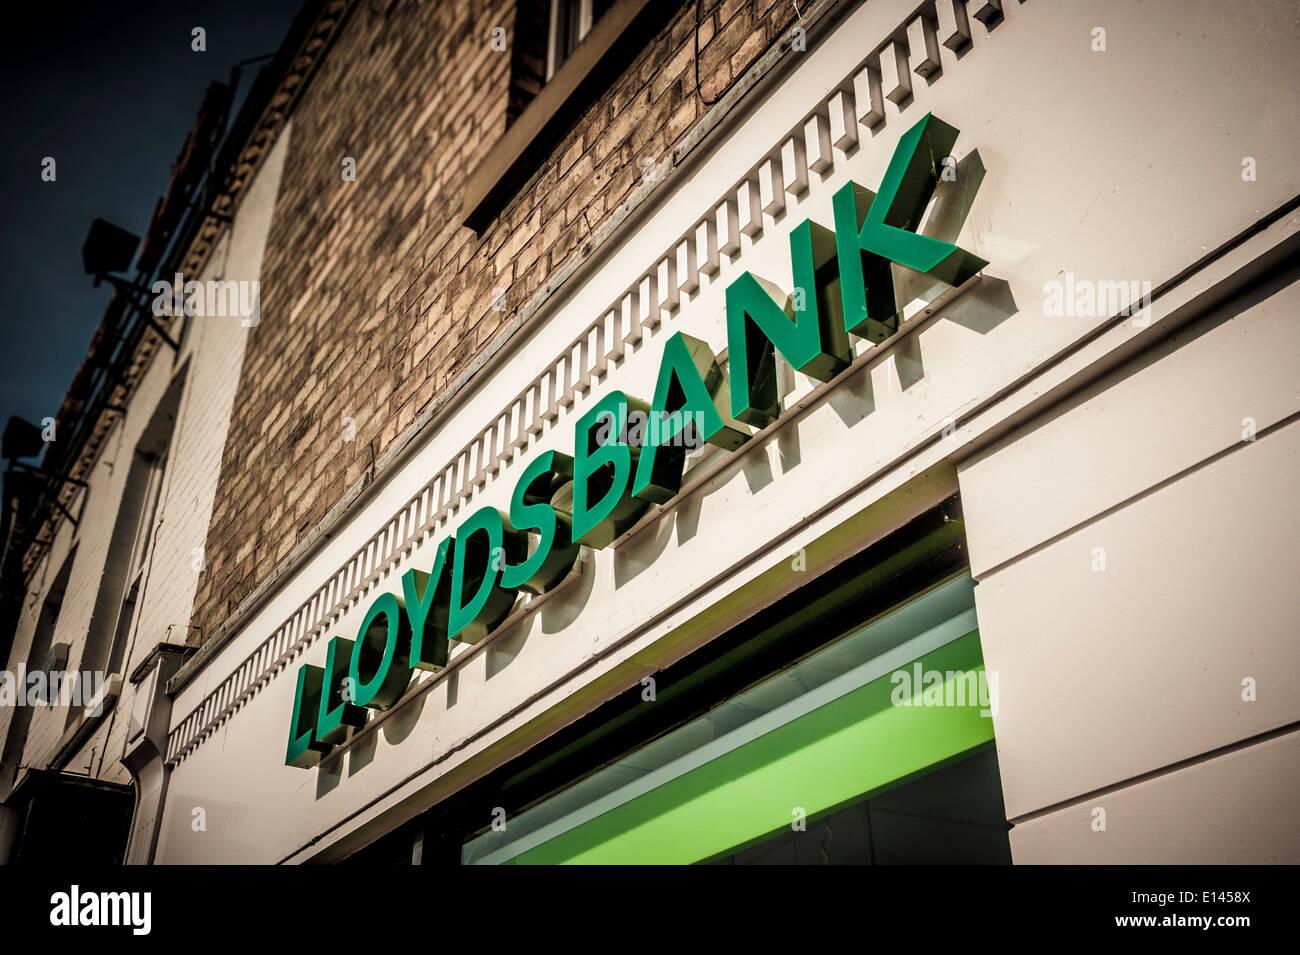 Lloyds bank sign - Stock Image